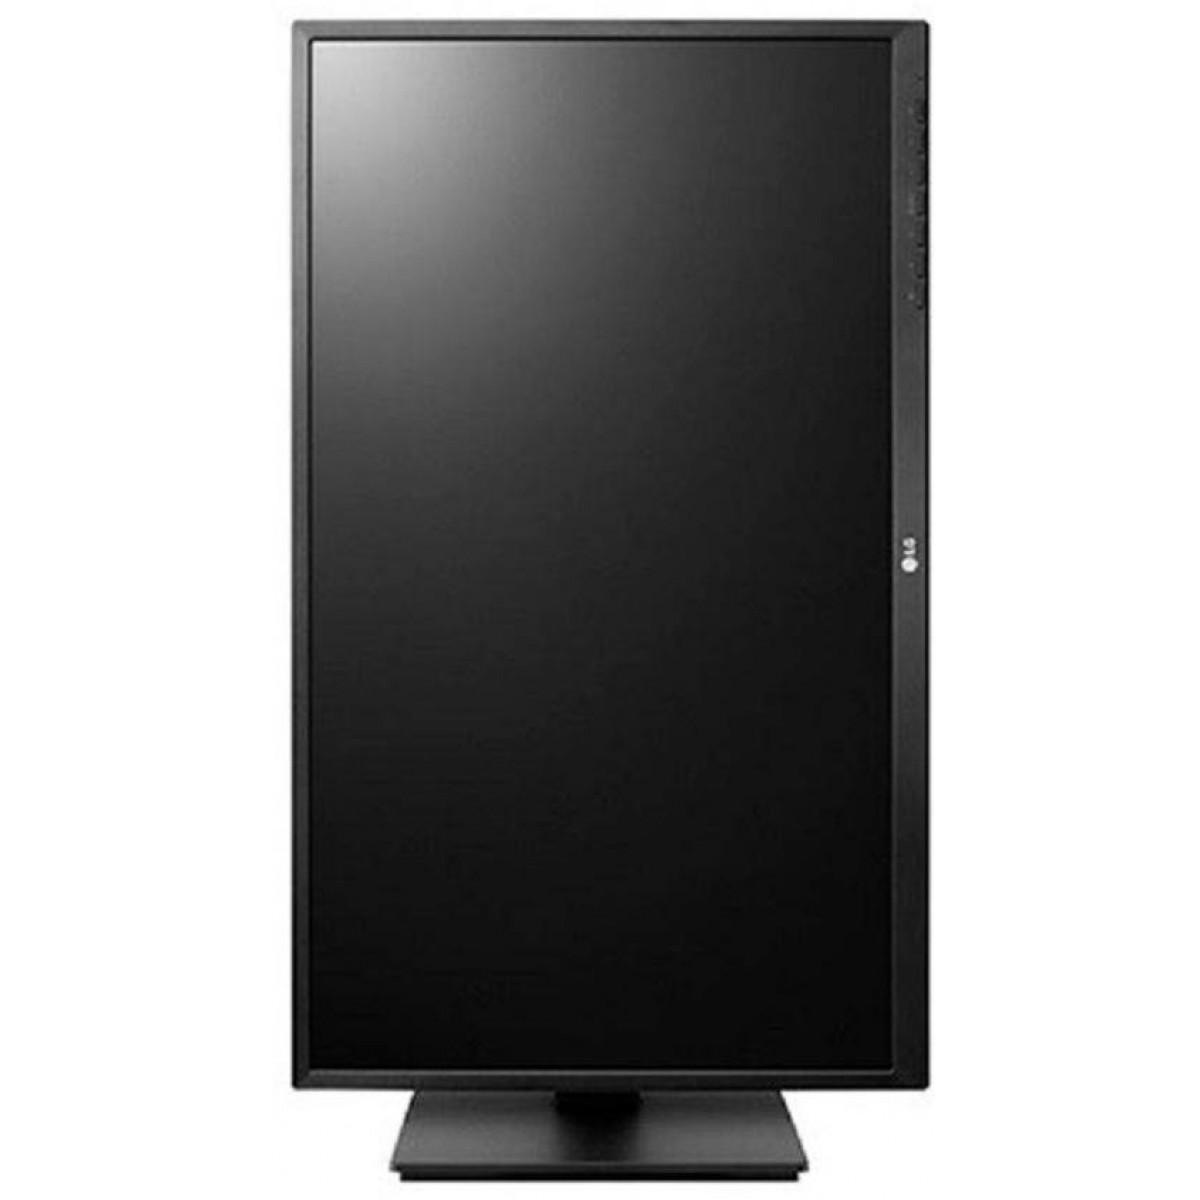 Monitor Gamer LG 23,8 Pol, Full HD, LED, HDMI, 24BL550J